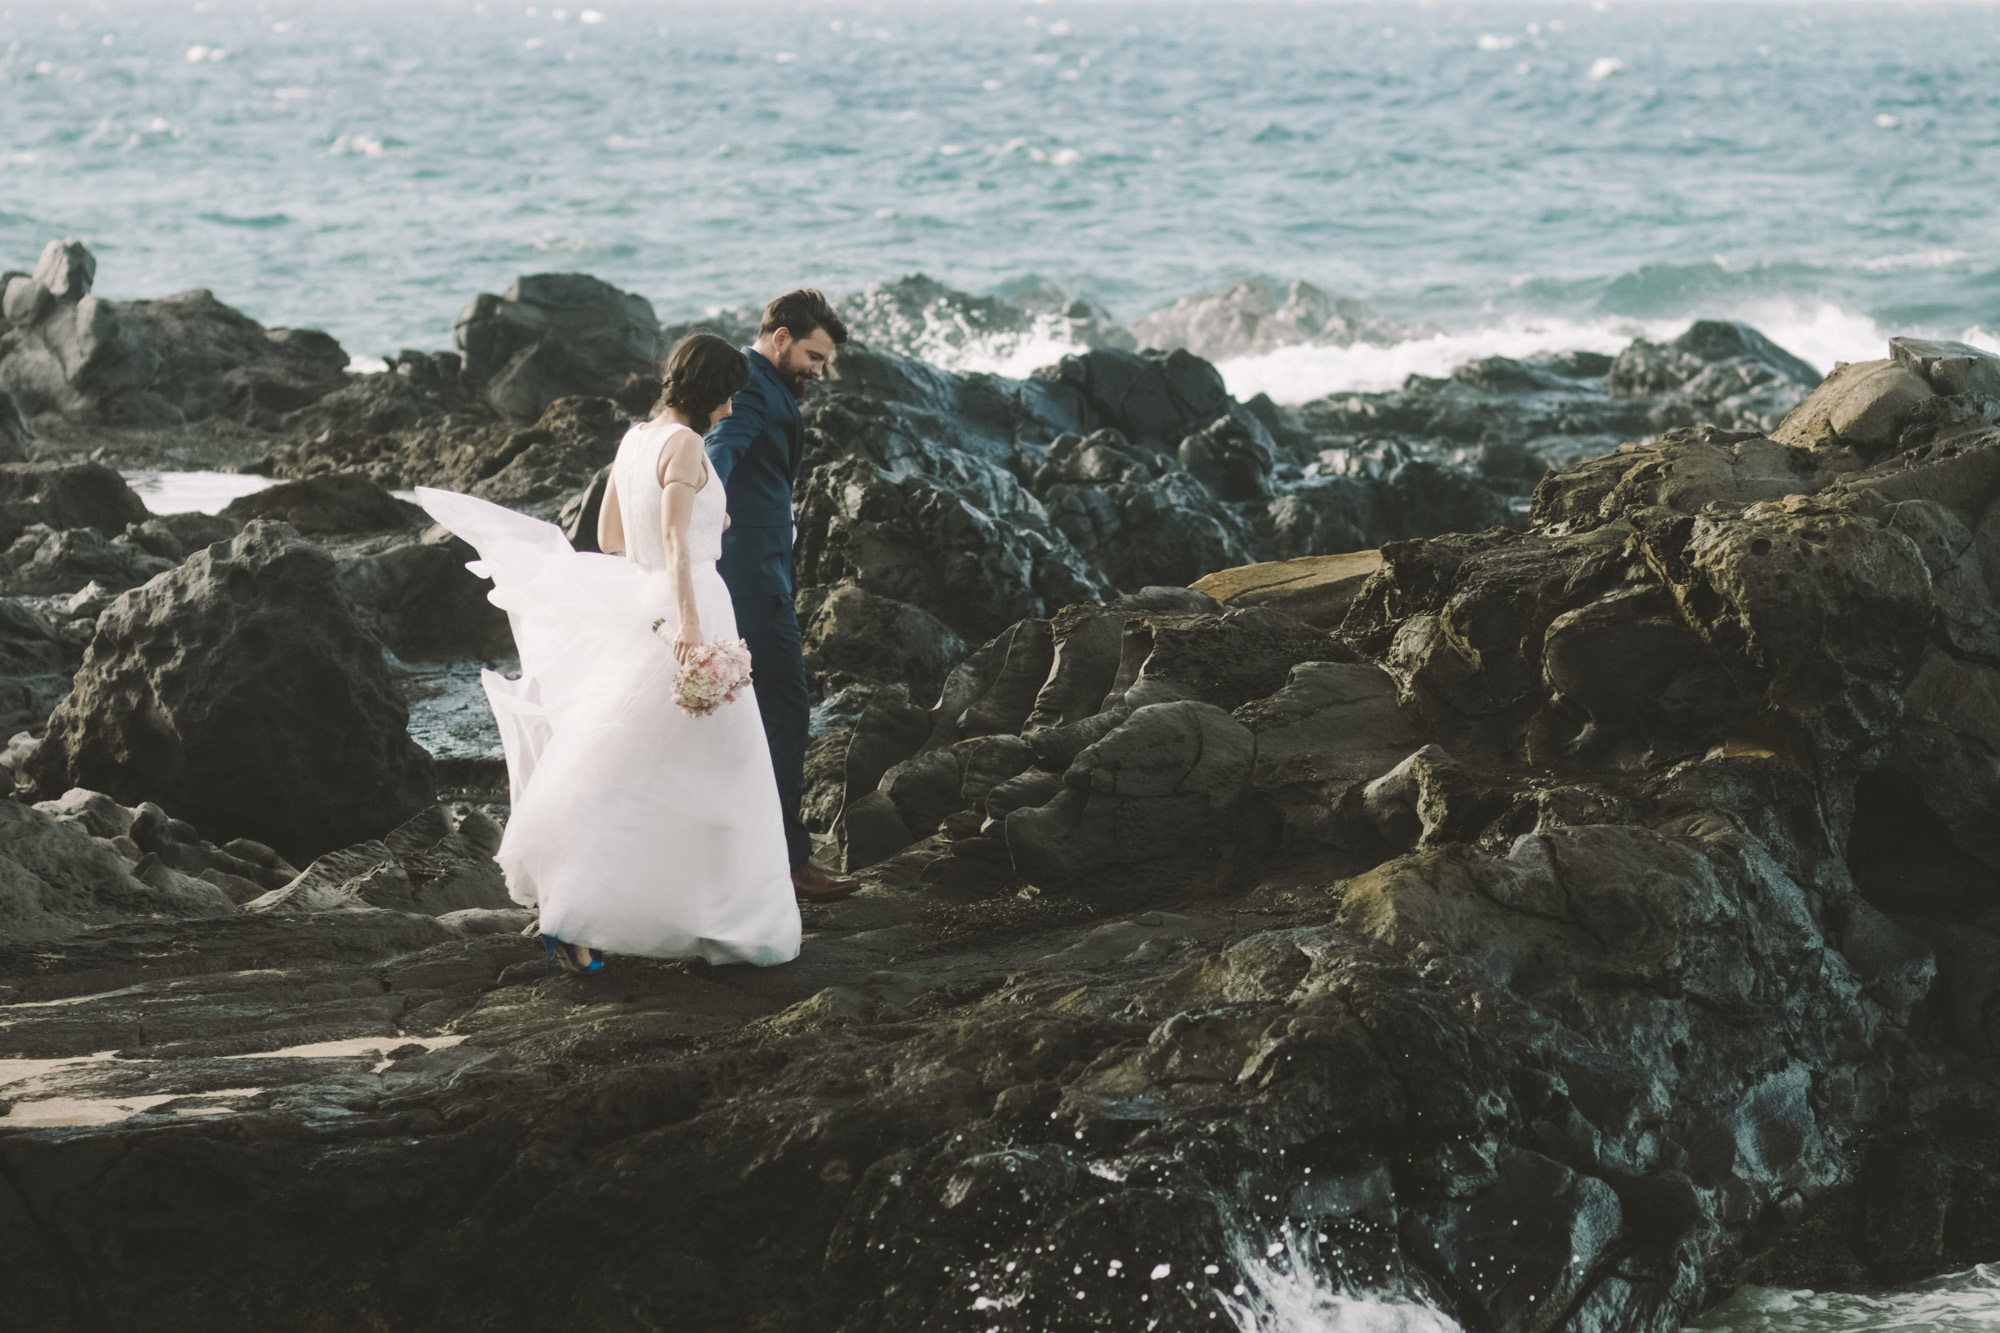 Maui hawaii photographer wedding inspiration_8.jpg